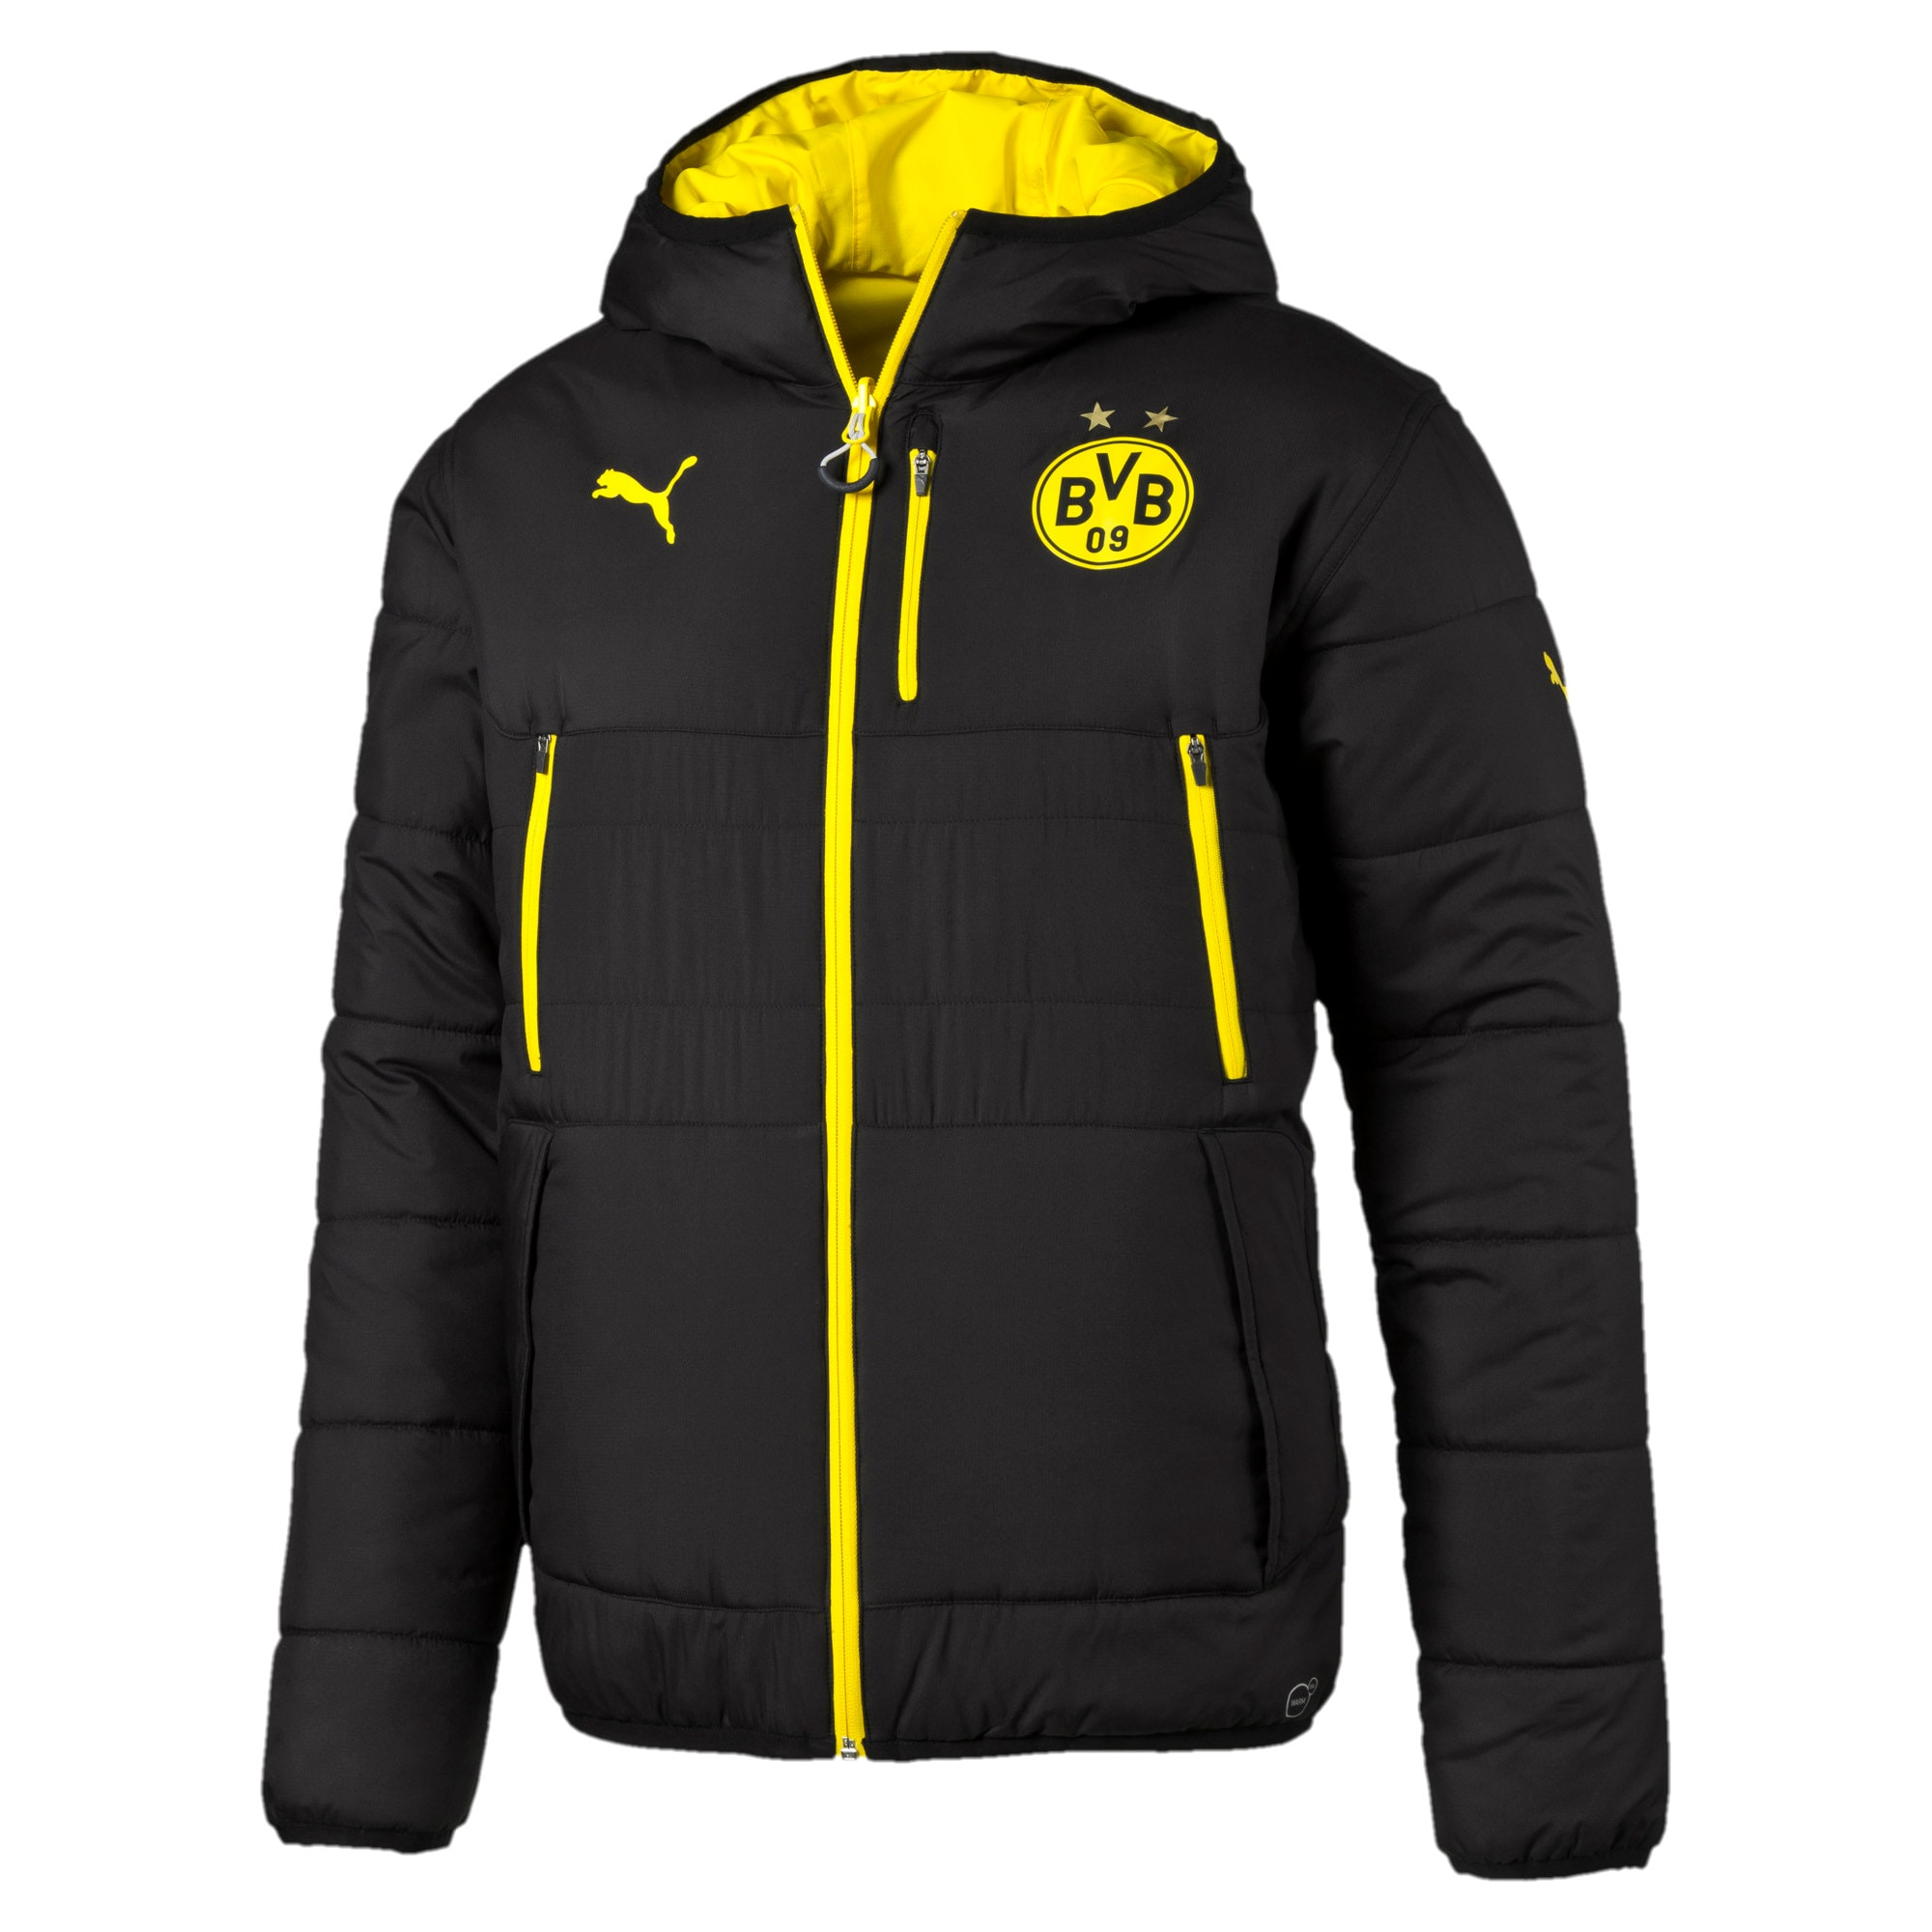 colore nero Giacca a vento BVB Borussia Dortmund Calcio Fan Shop ...